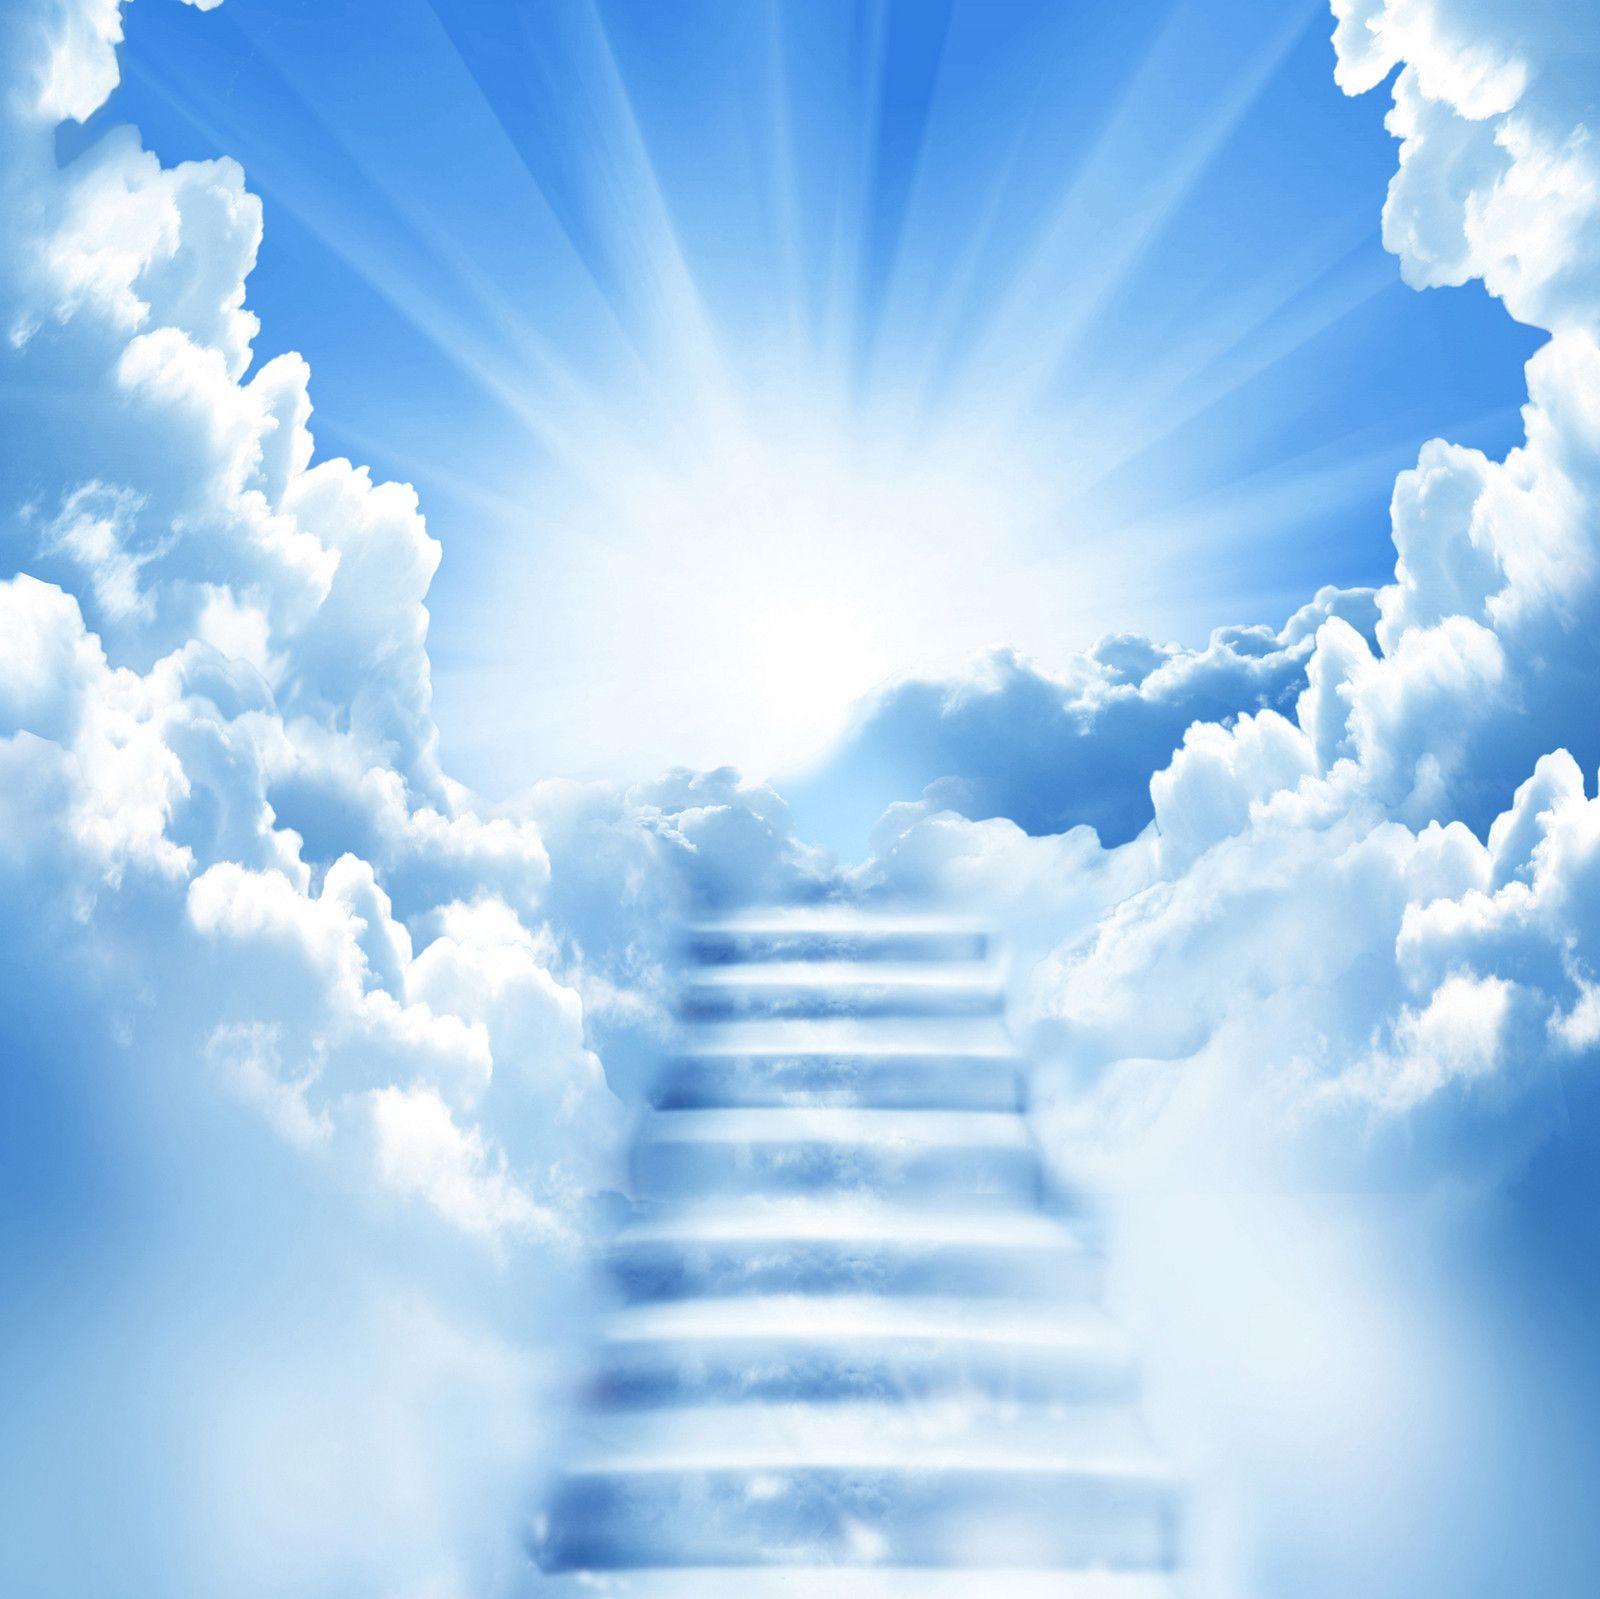 funeral program background – Funeral Program Background